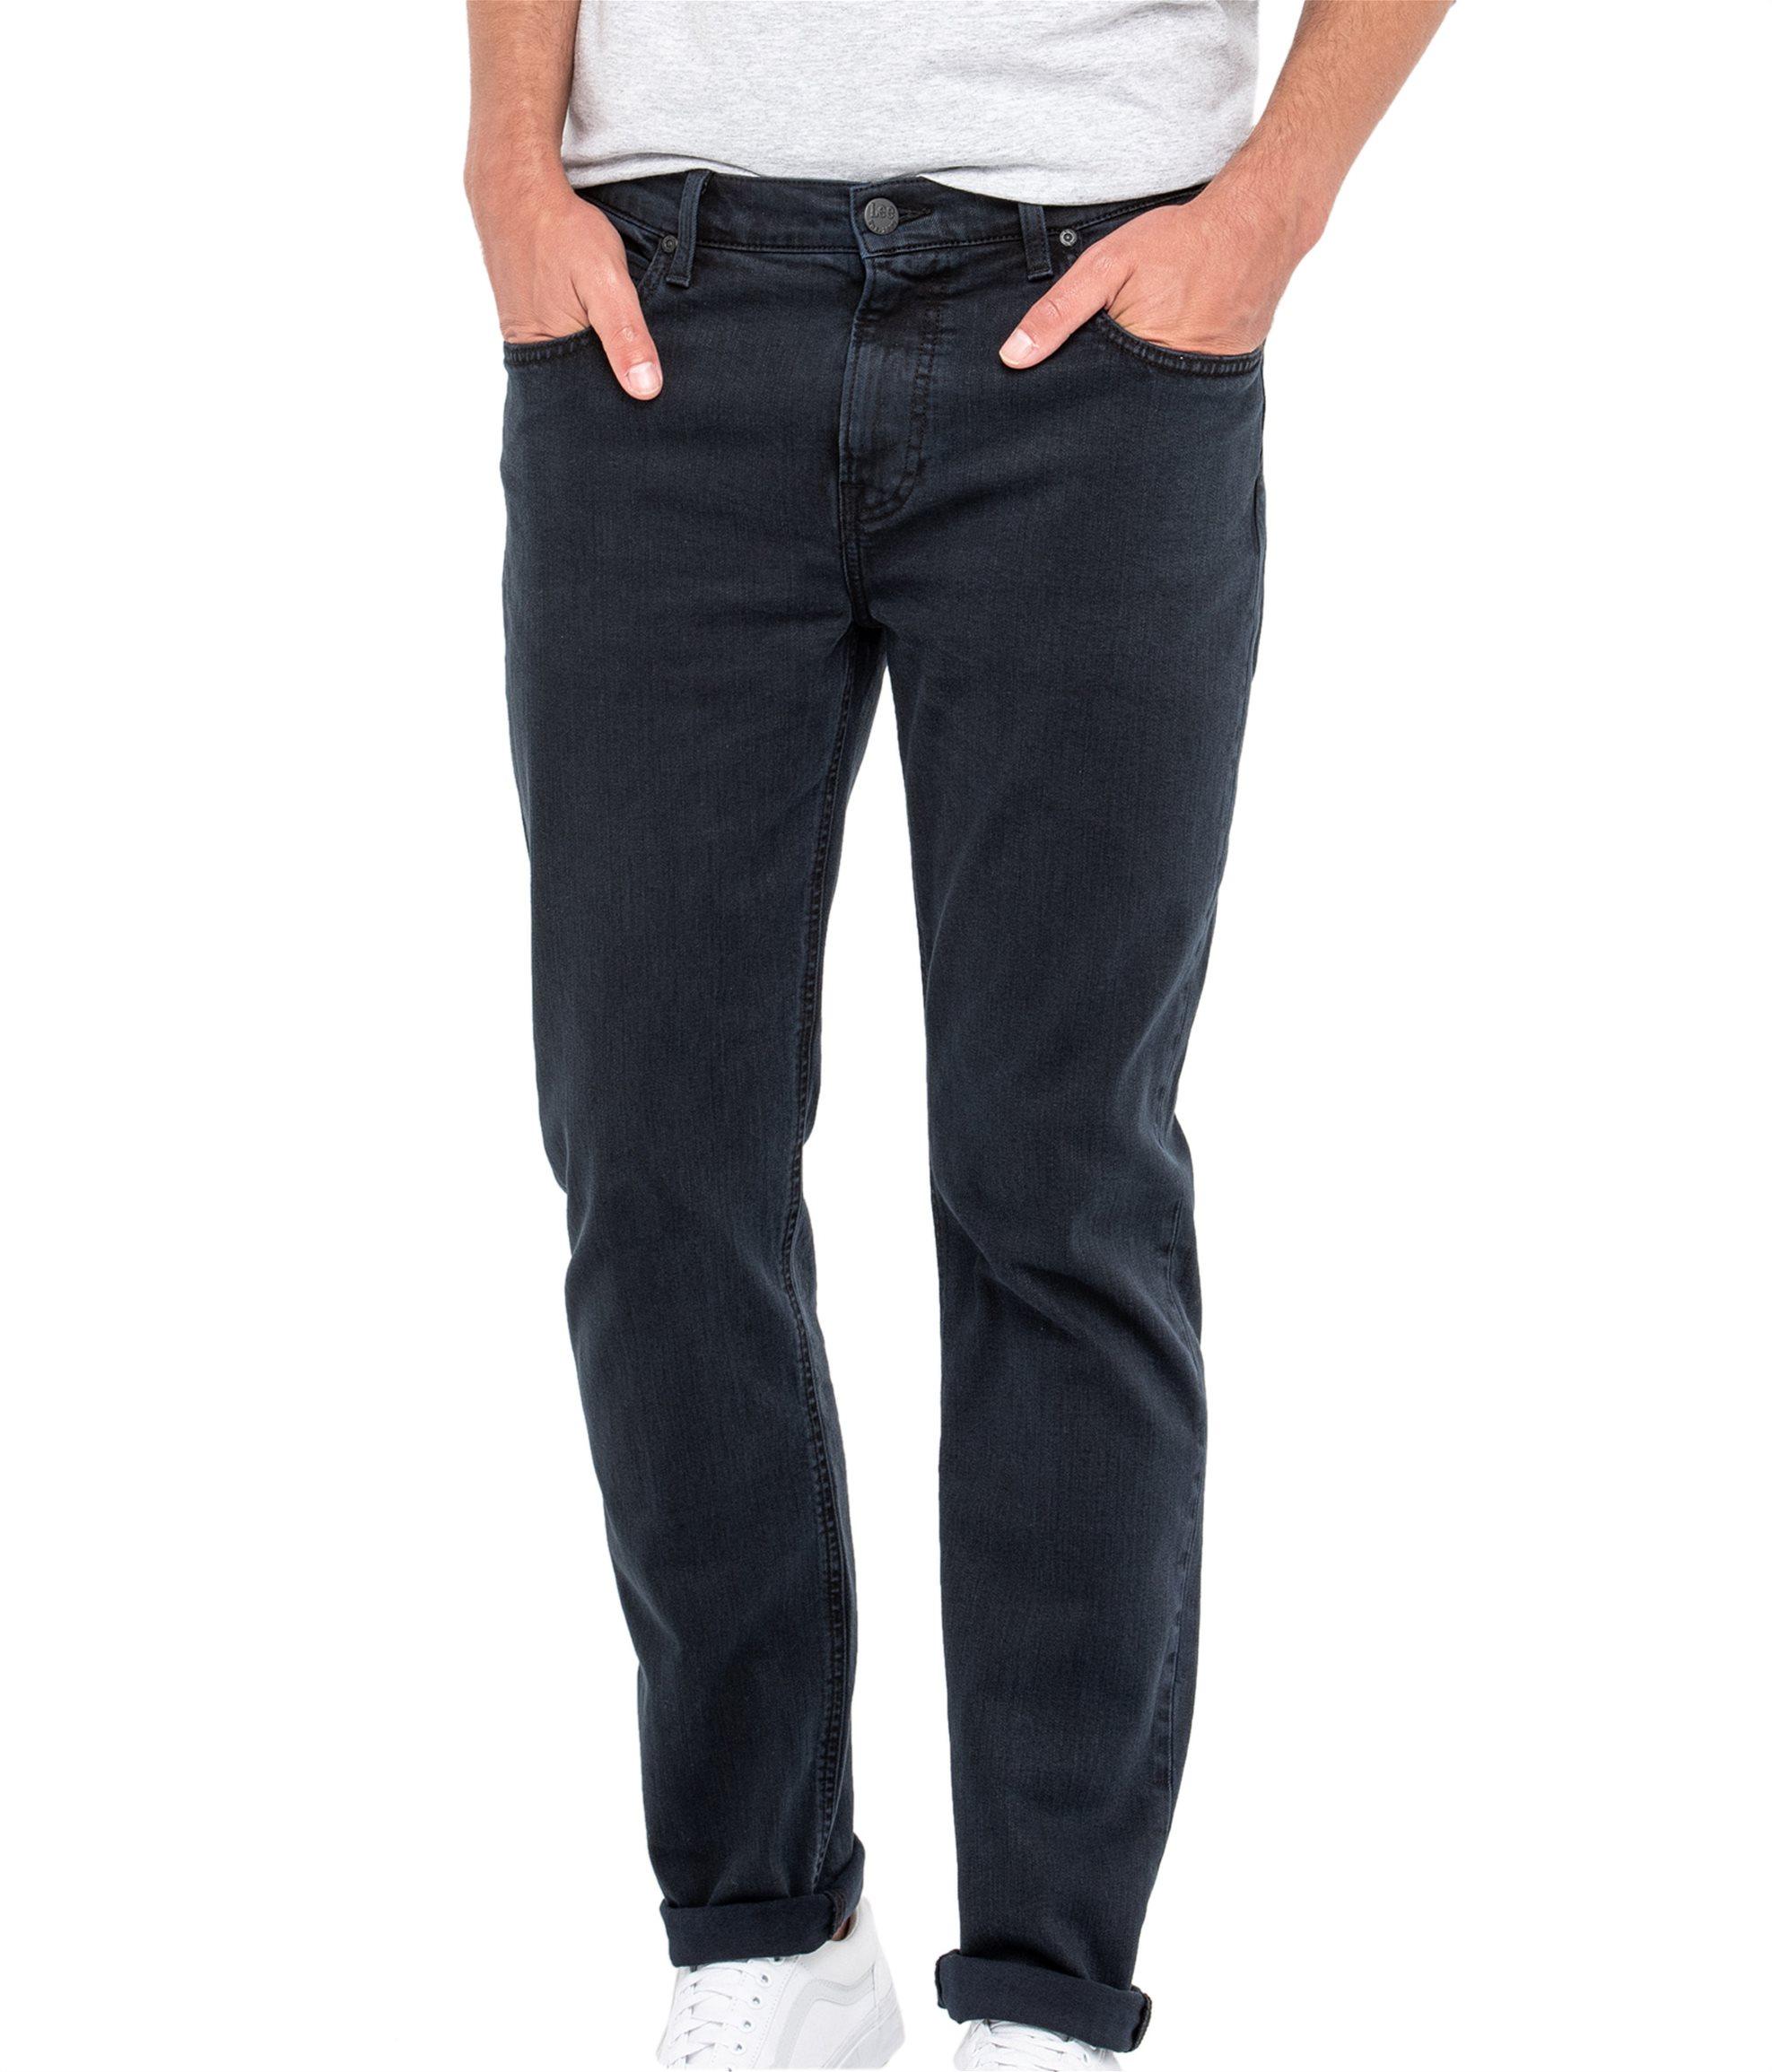 Lee Arvin regular tapered ανδρικό τζην παντελόνι Black Night - L732JBGZ - Μαύρο ανδρασ   ρουχα   jeans   tapered